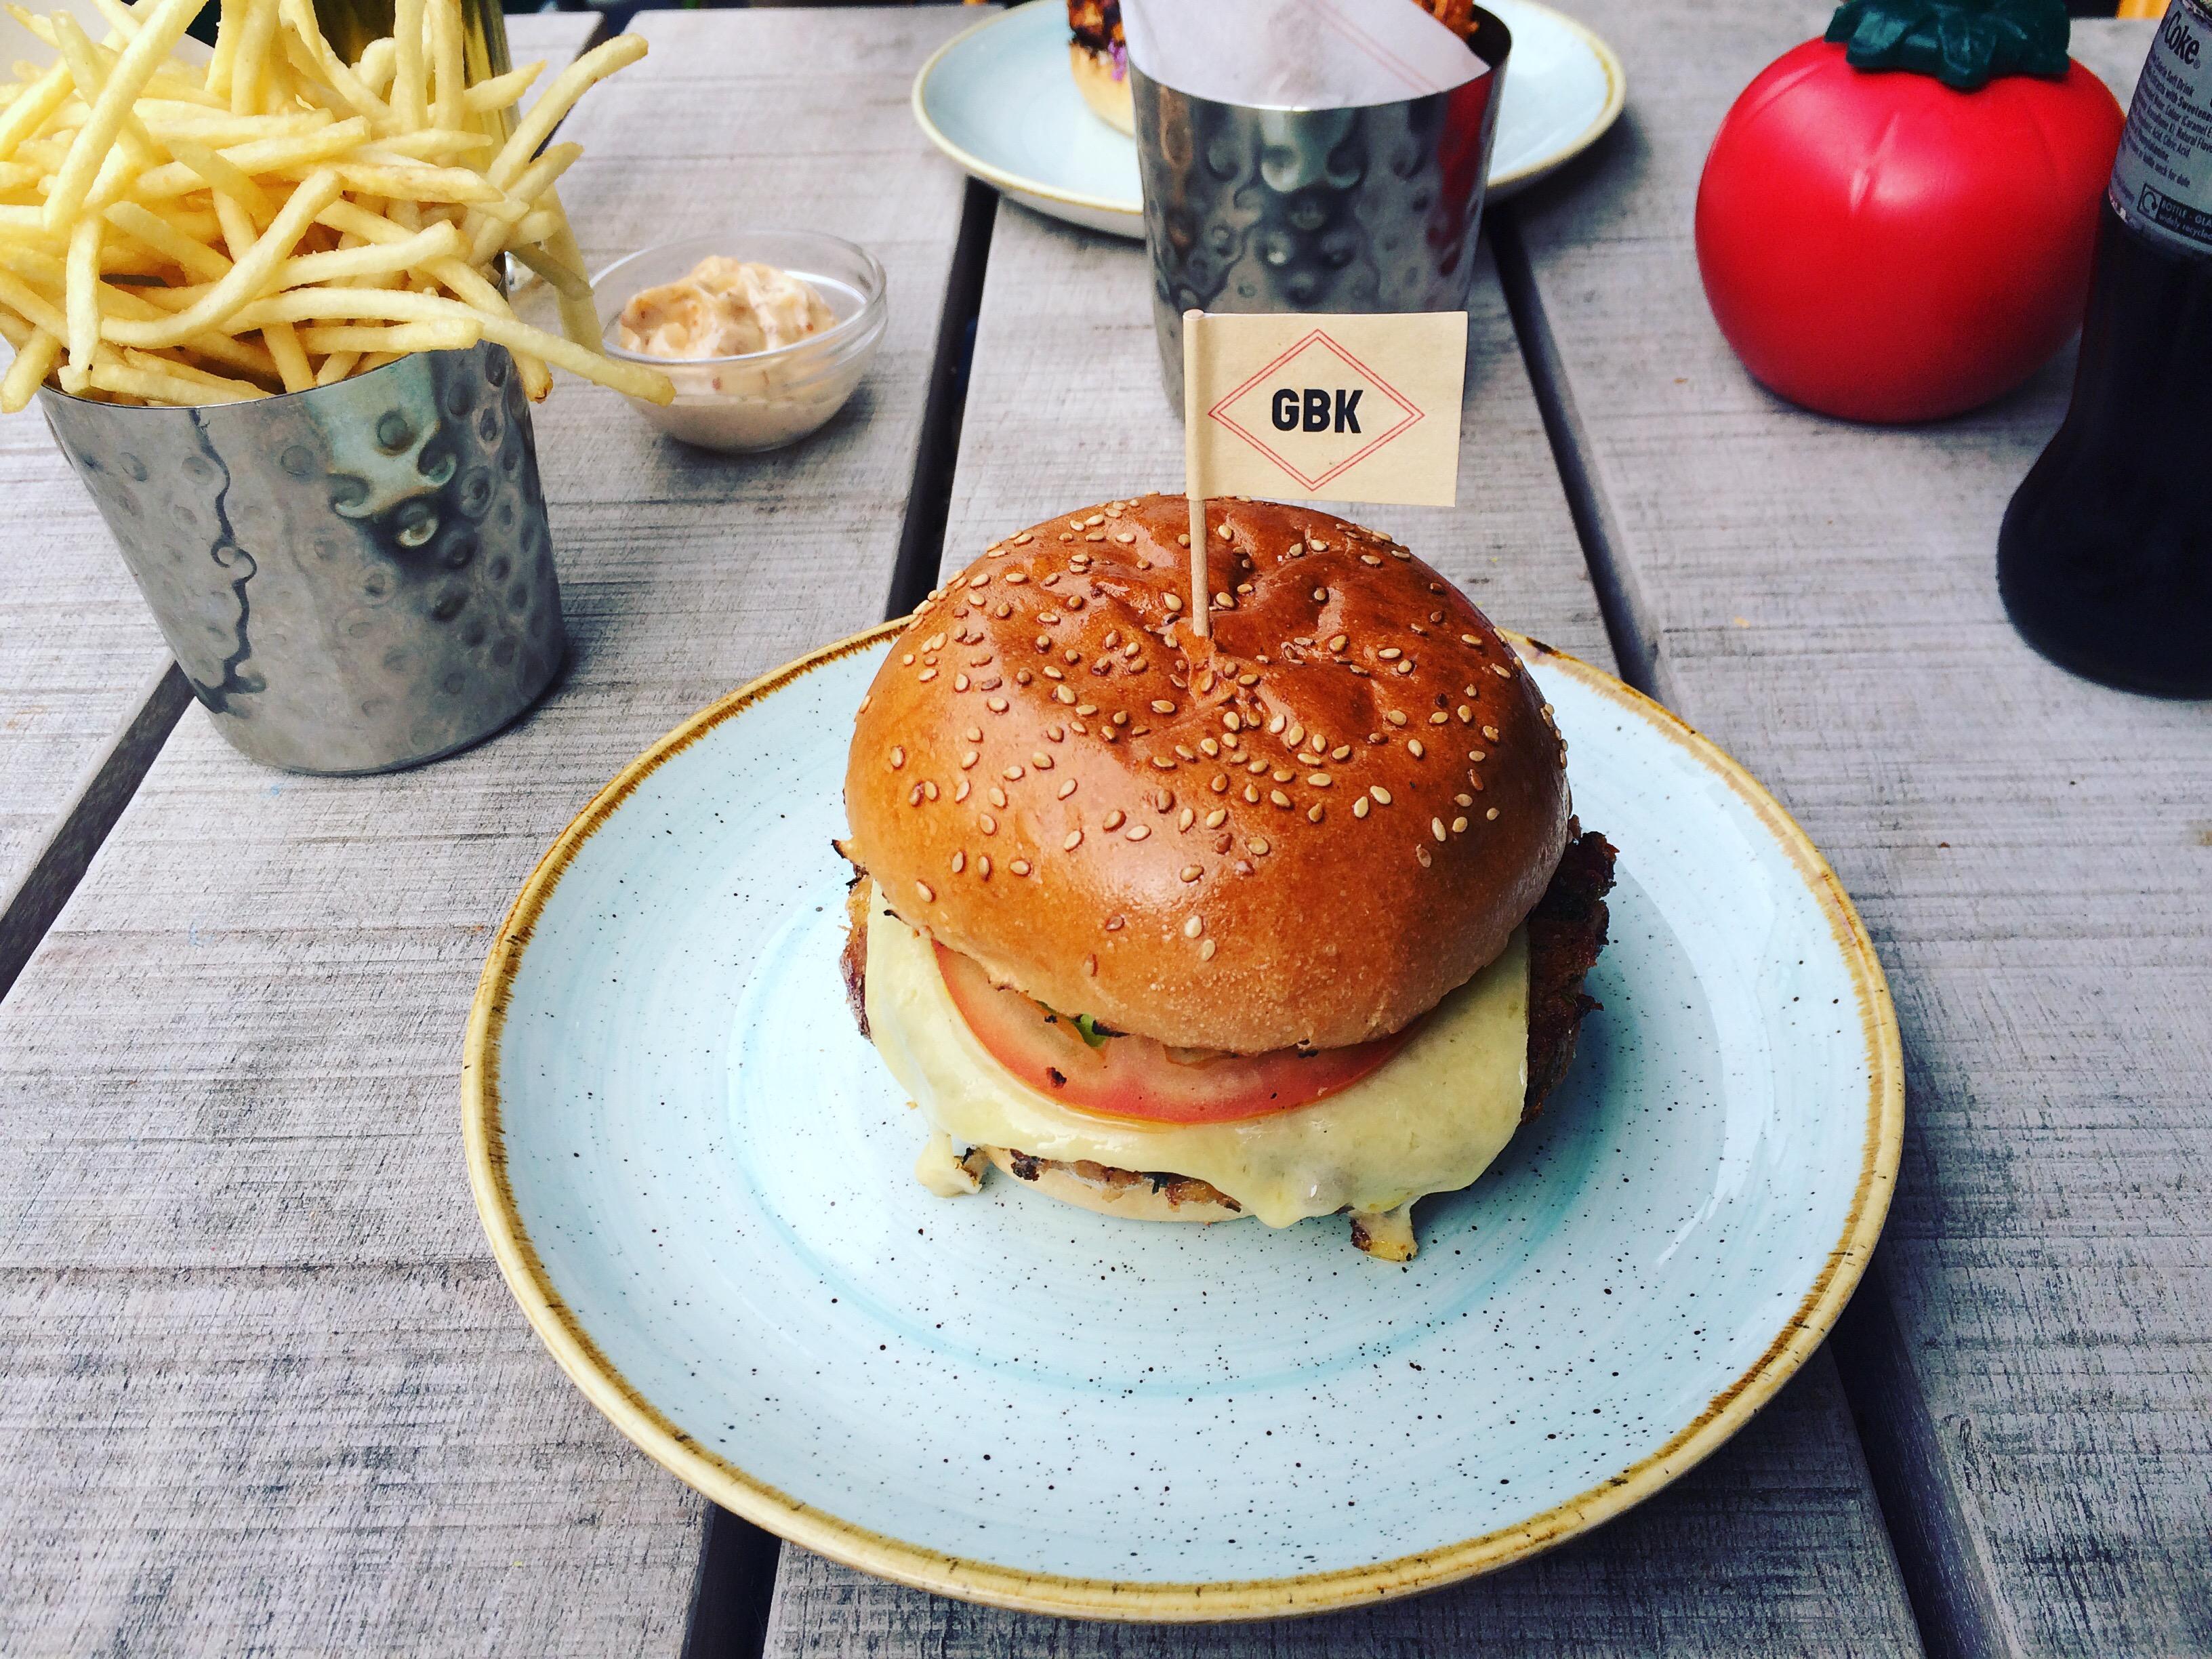 Veggie burger at GBK